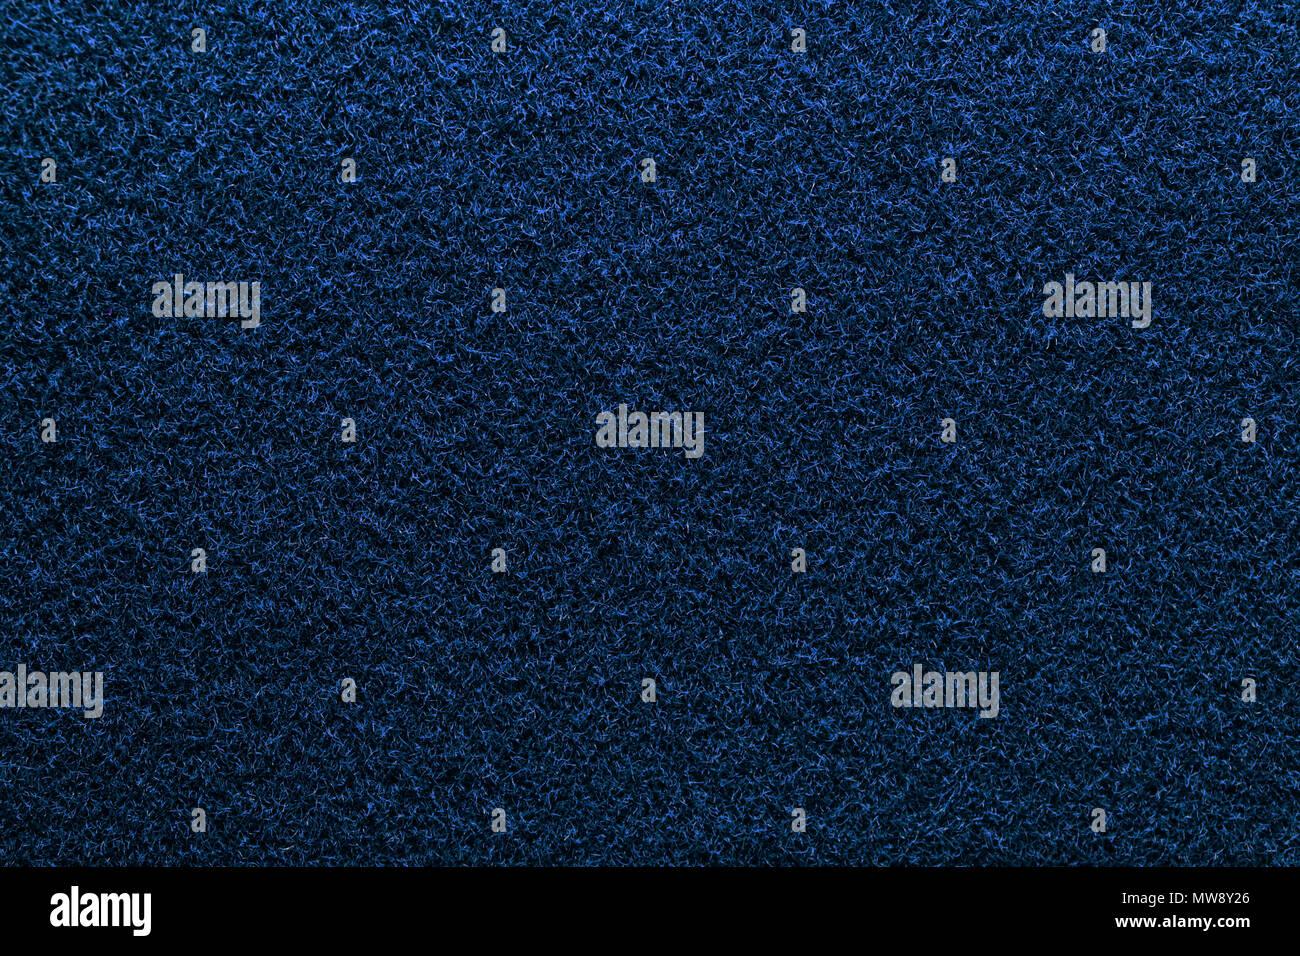 Blu Scuro Materiale Morbido Texture Blu Notte Fibre Dettagliata